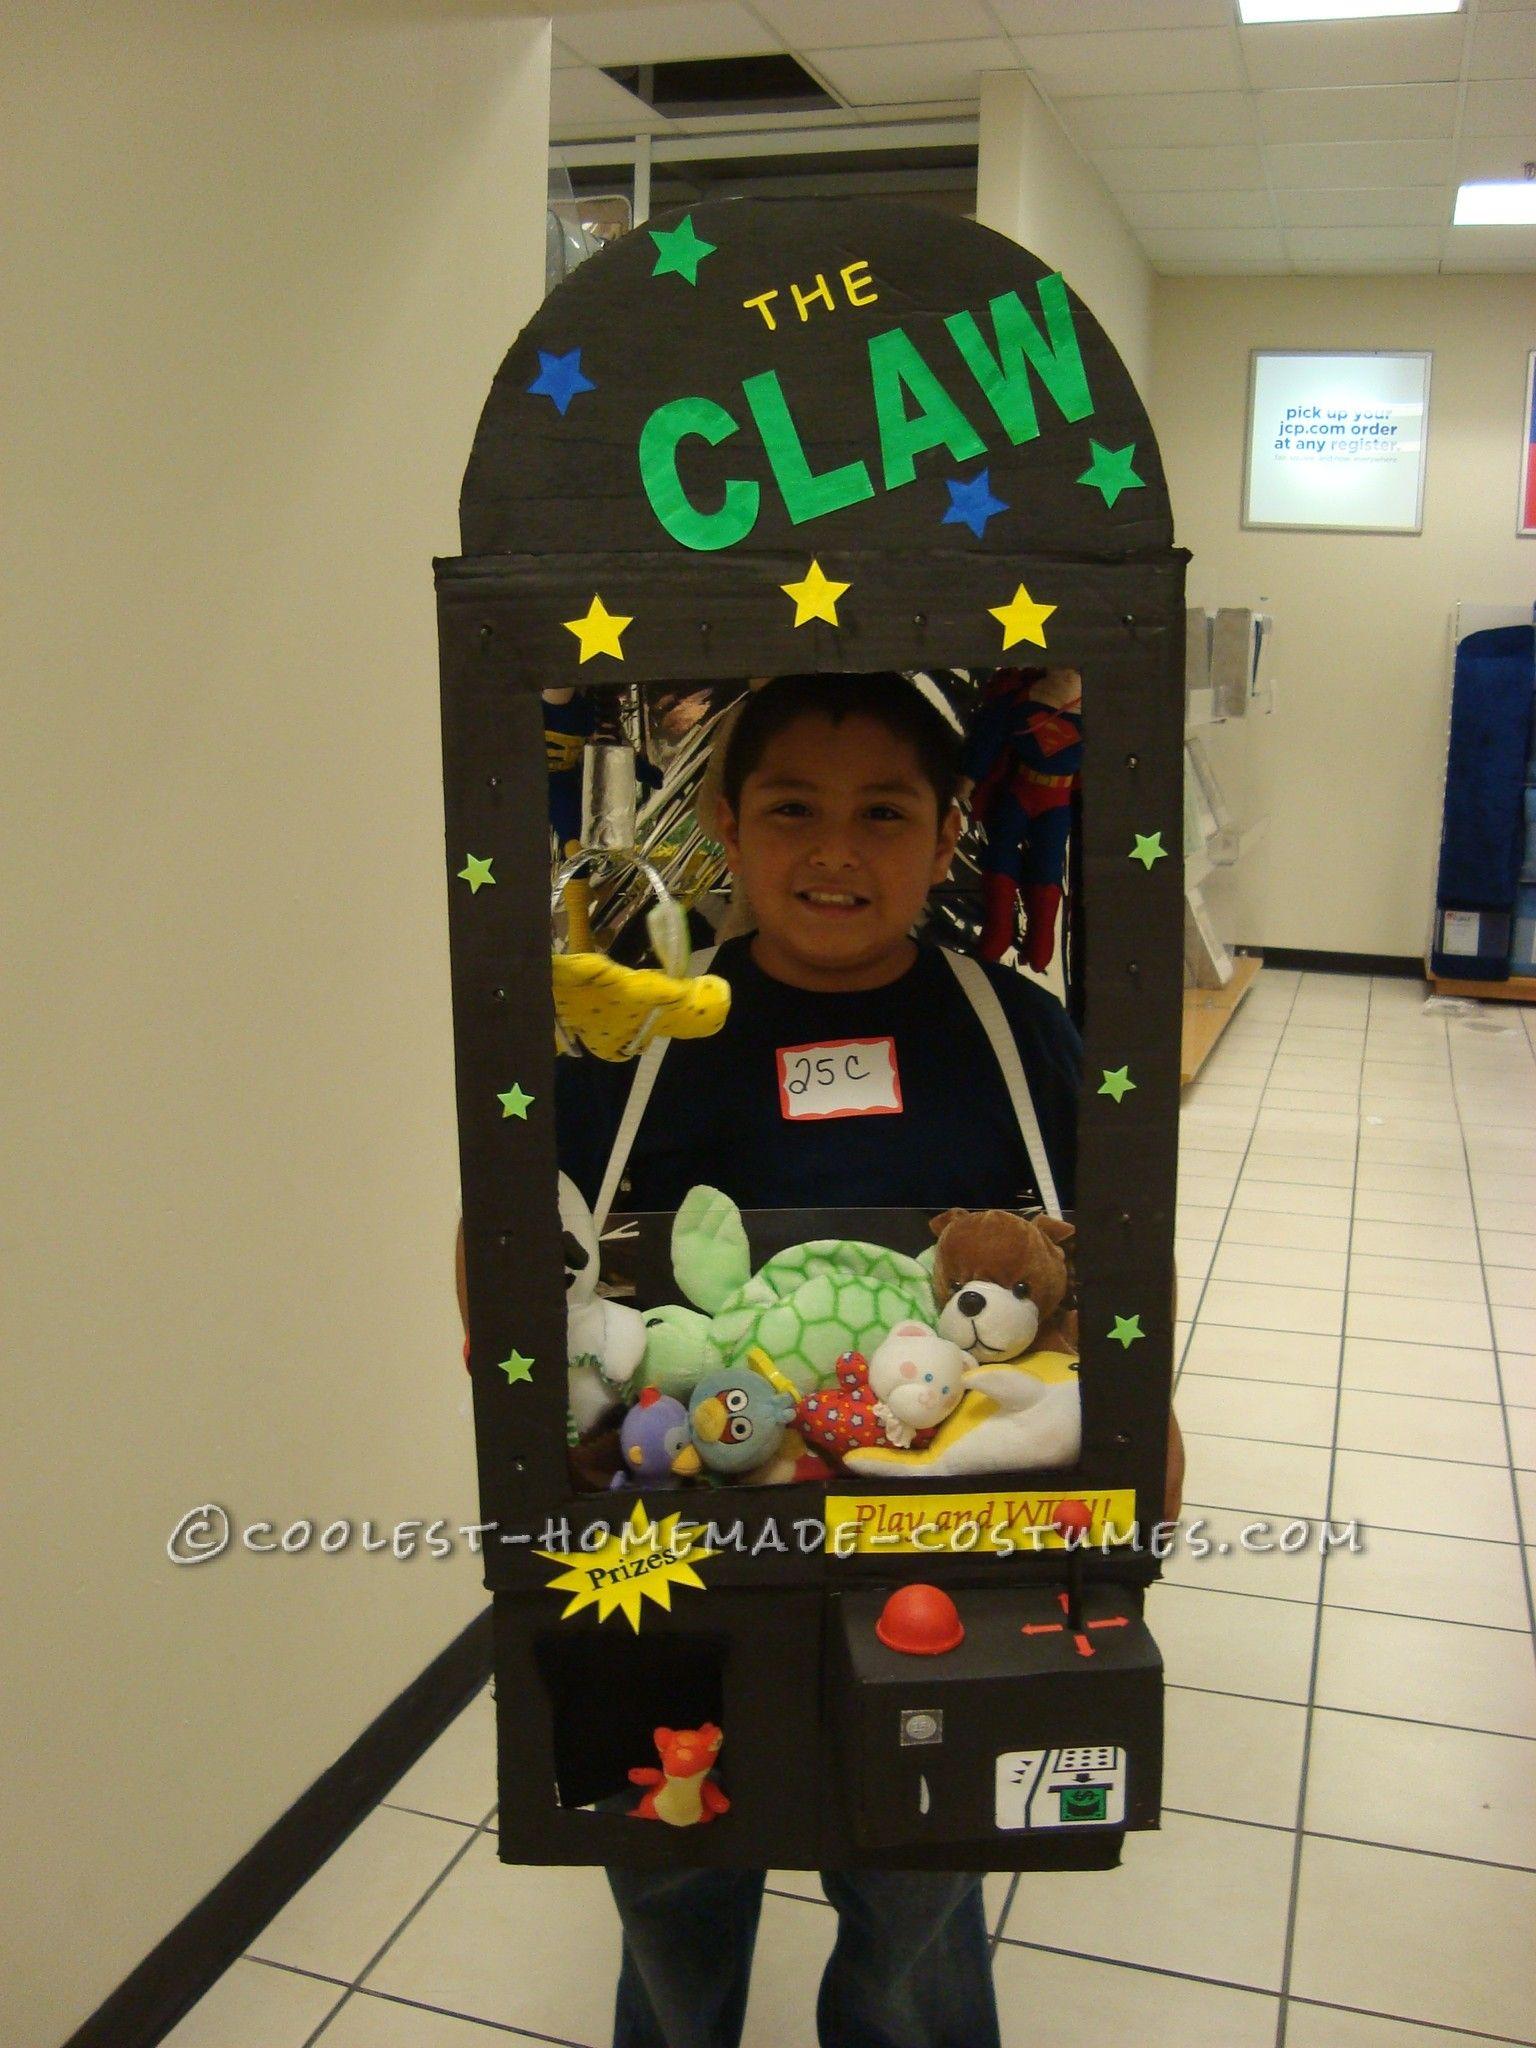 Coolest Diy Claw Machine Arcade Game Costume Game